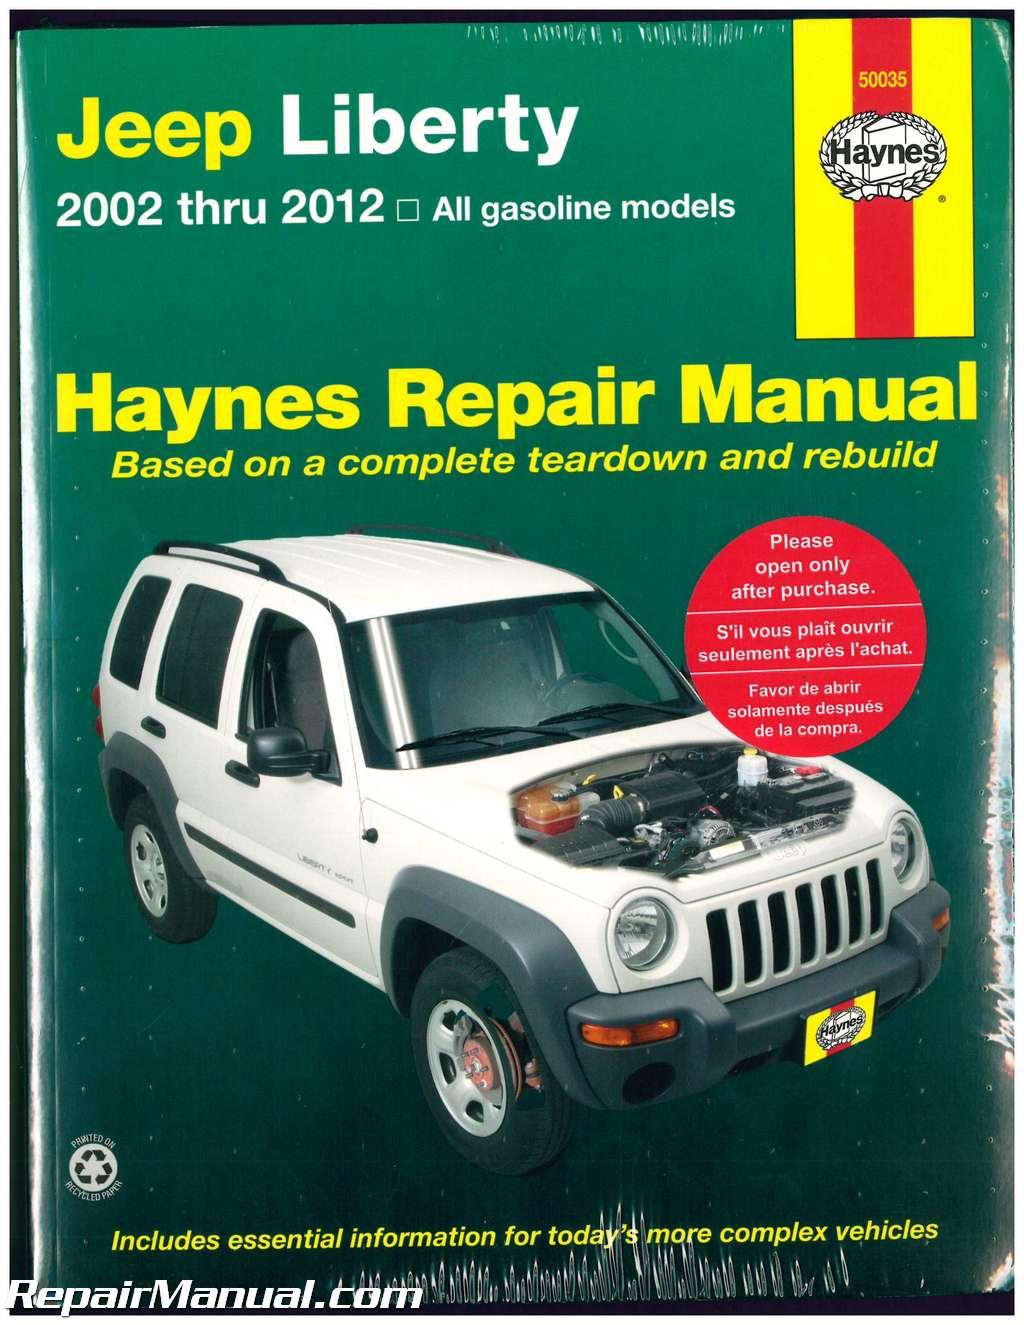 haynes jeep liberty 2002 2012 auto repair manual rh repairmanual com haynes repair manual jeep cherokee 1984 thru 2001 haynes repair manual jeep grand cherokee 1993 thru 2004